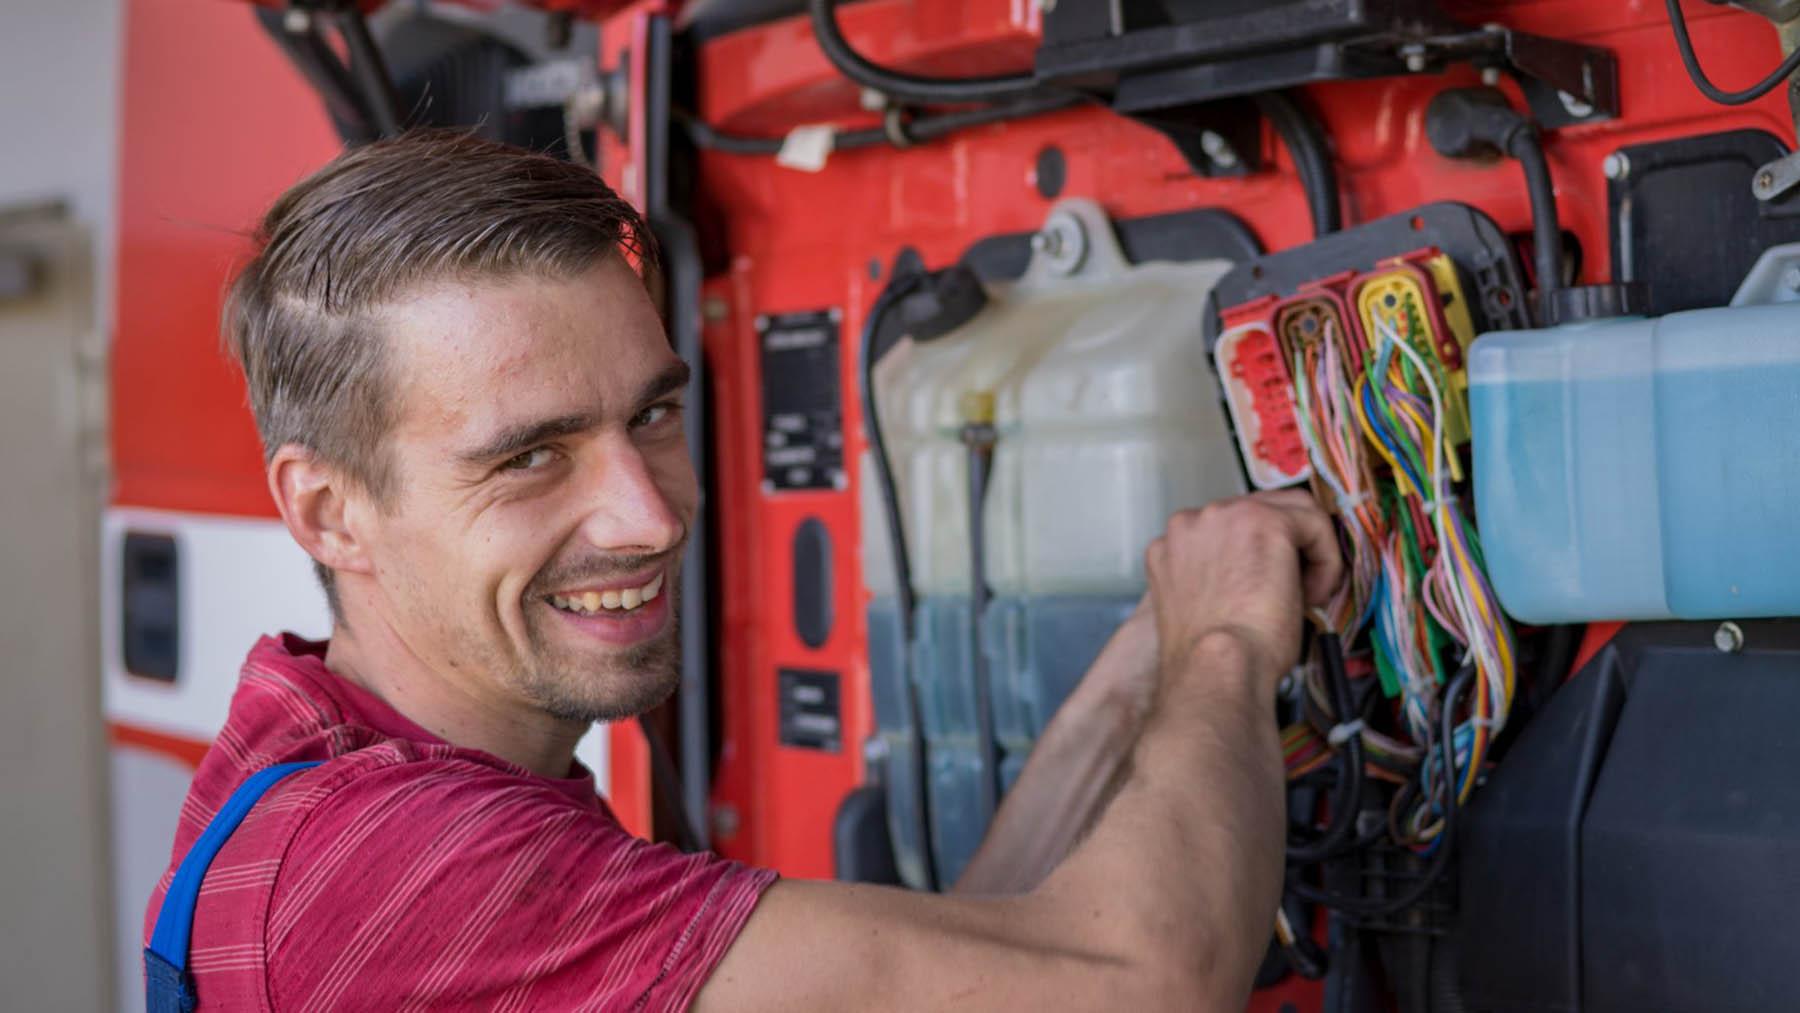 Schober Nutzfahrzeuge Oschatz Instandsetzung Reparatur Werkstatt